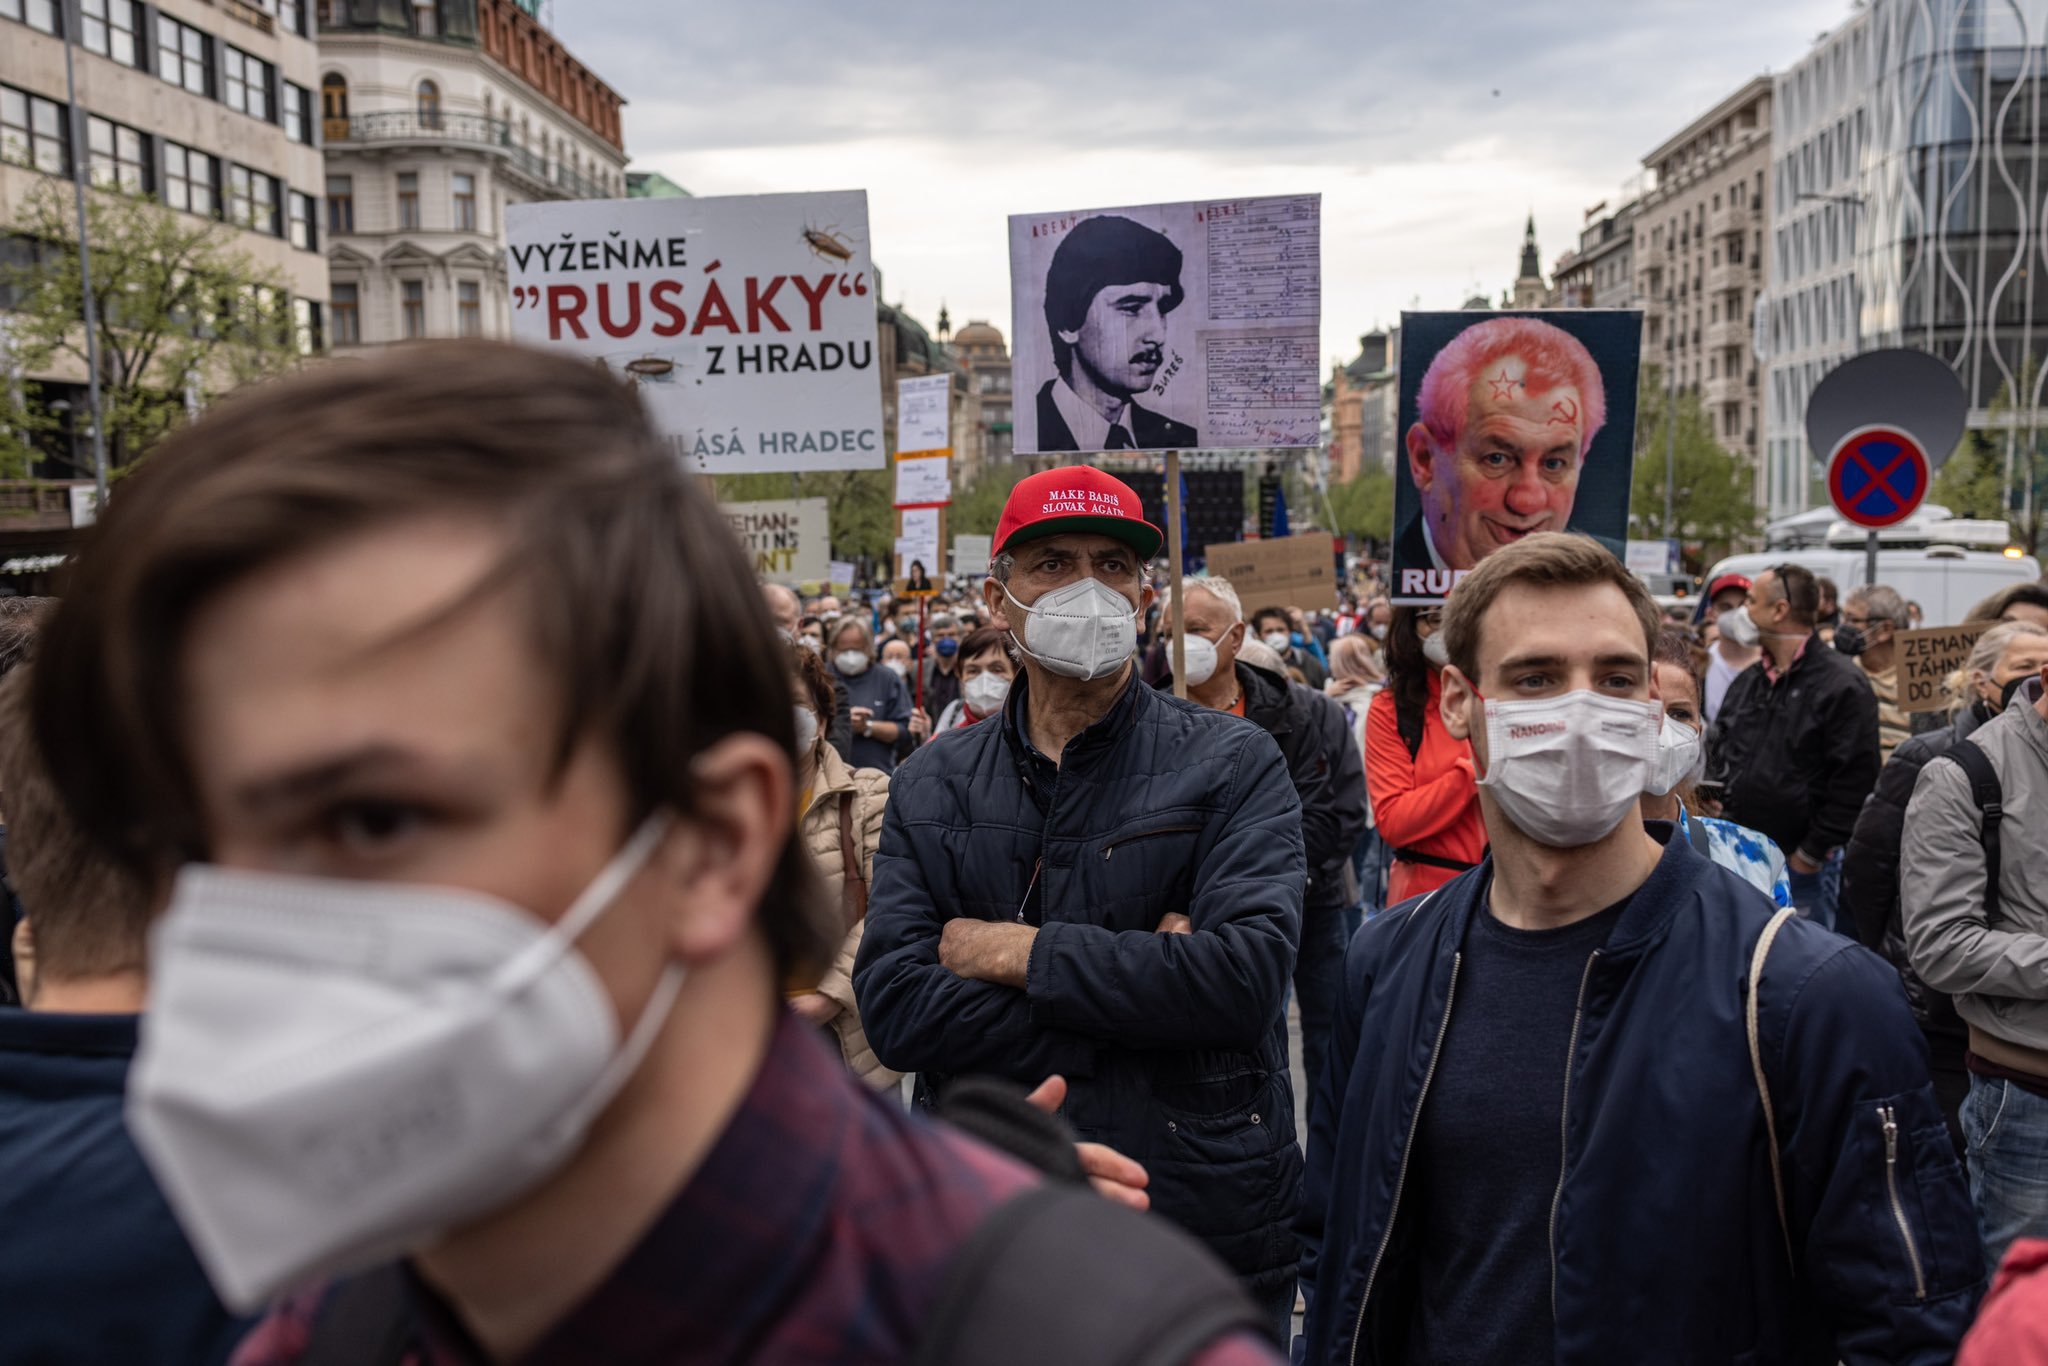 Češki senat planira suditi proruskog predsjednika za veleizdaju E0KjCmFXIAEdvQz?format=jpg&name=large